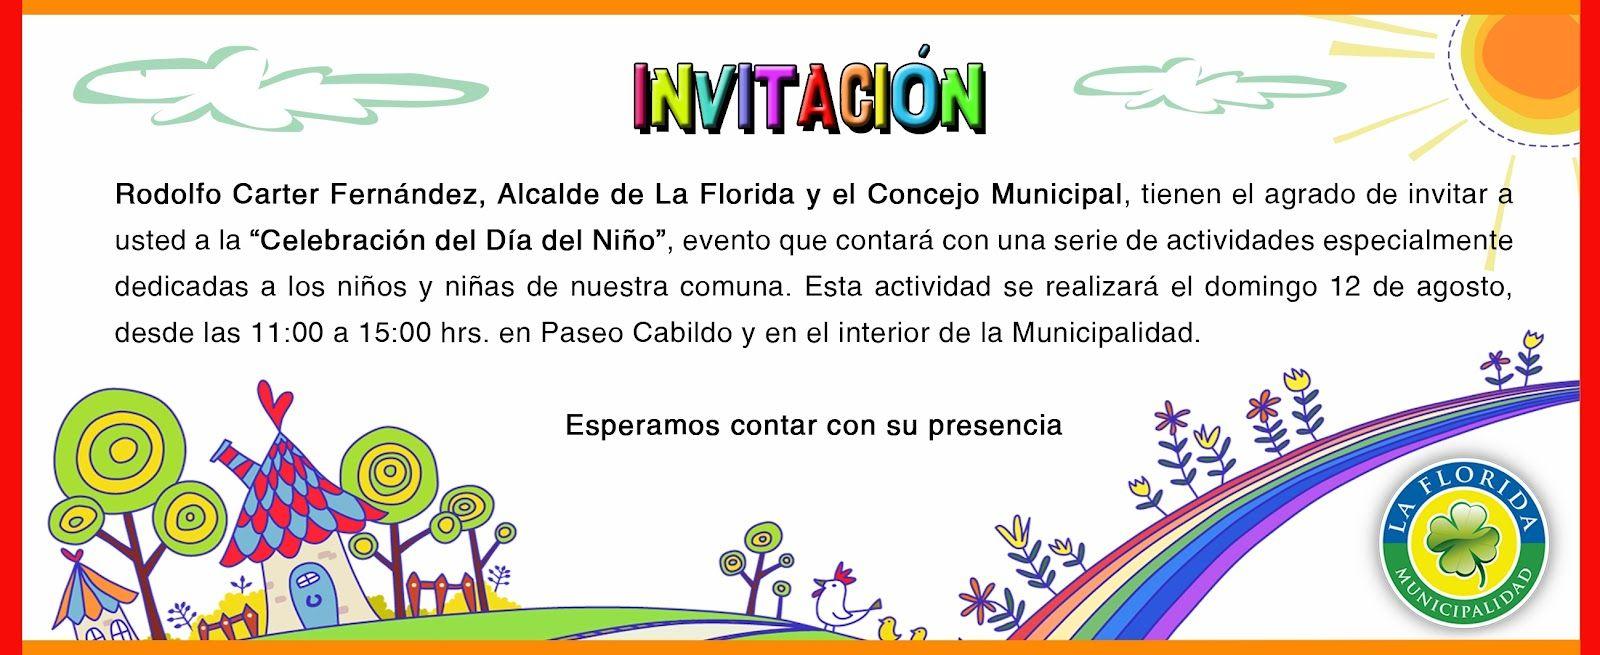 Tarjetas De Invitacion Del Dia Del Niño Para Pantalla Hd 2